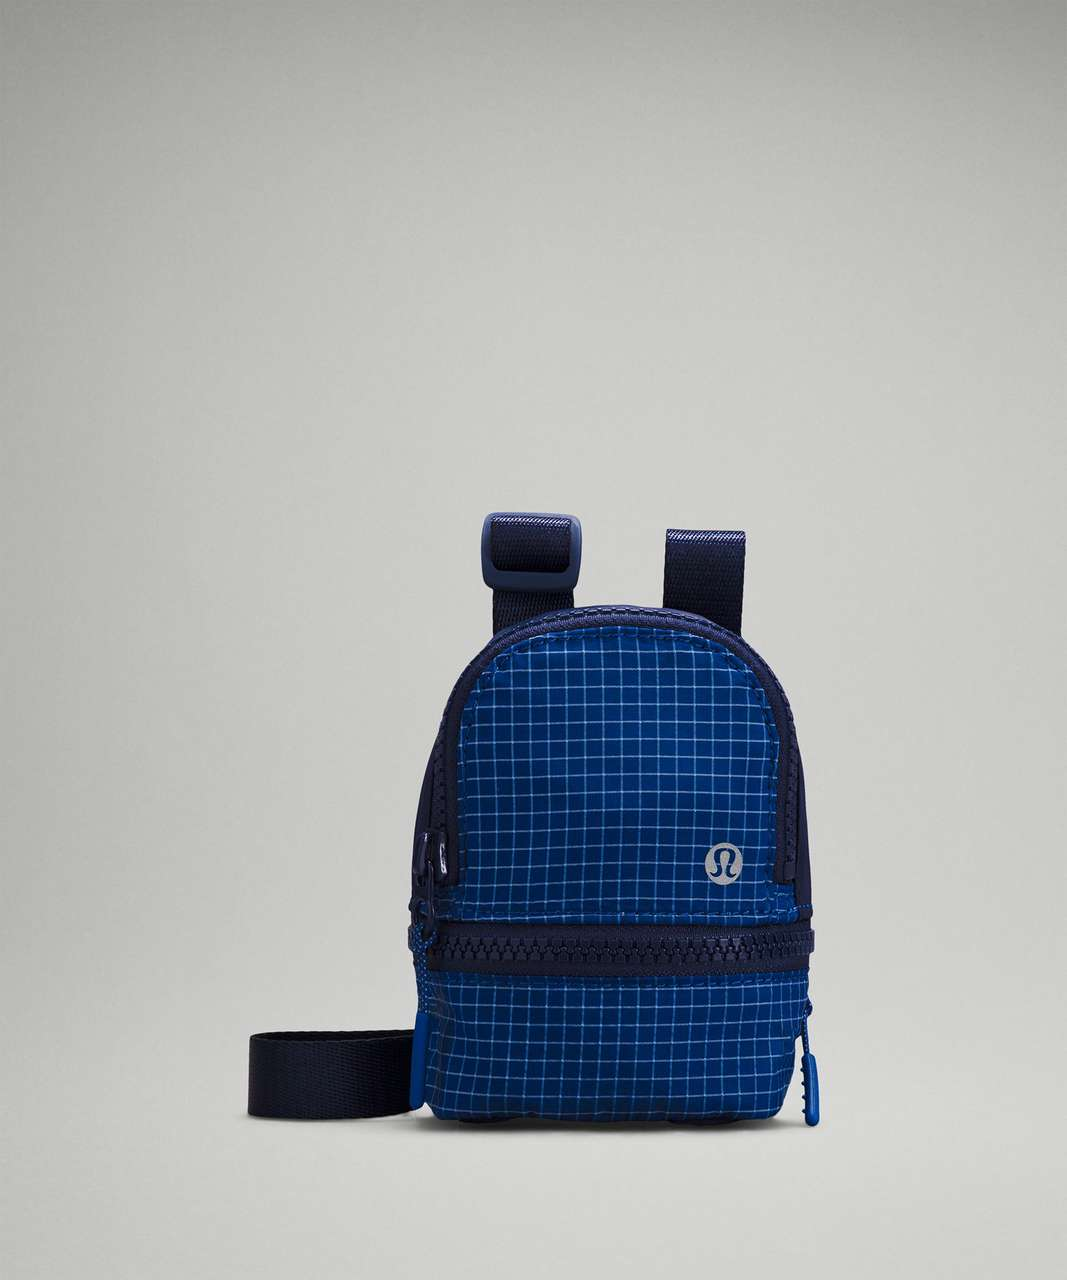 Lululemon City Adventurer Nano Crossbody Bag - Symphony Blue / Night Sea